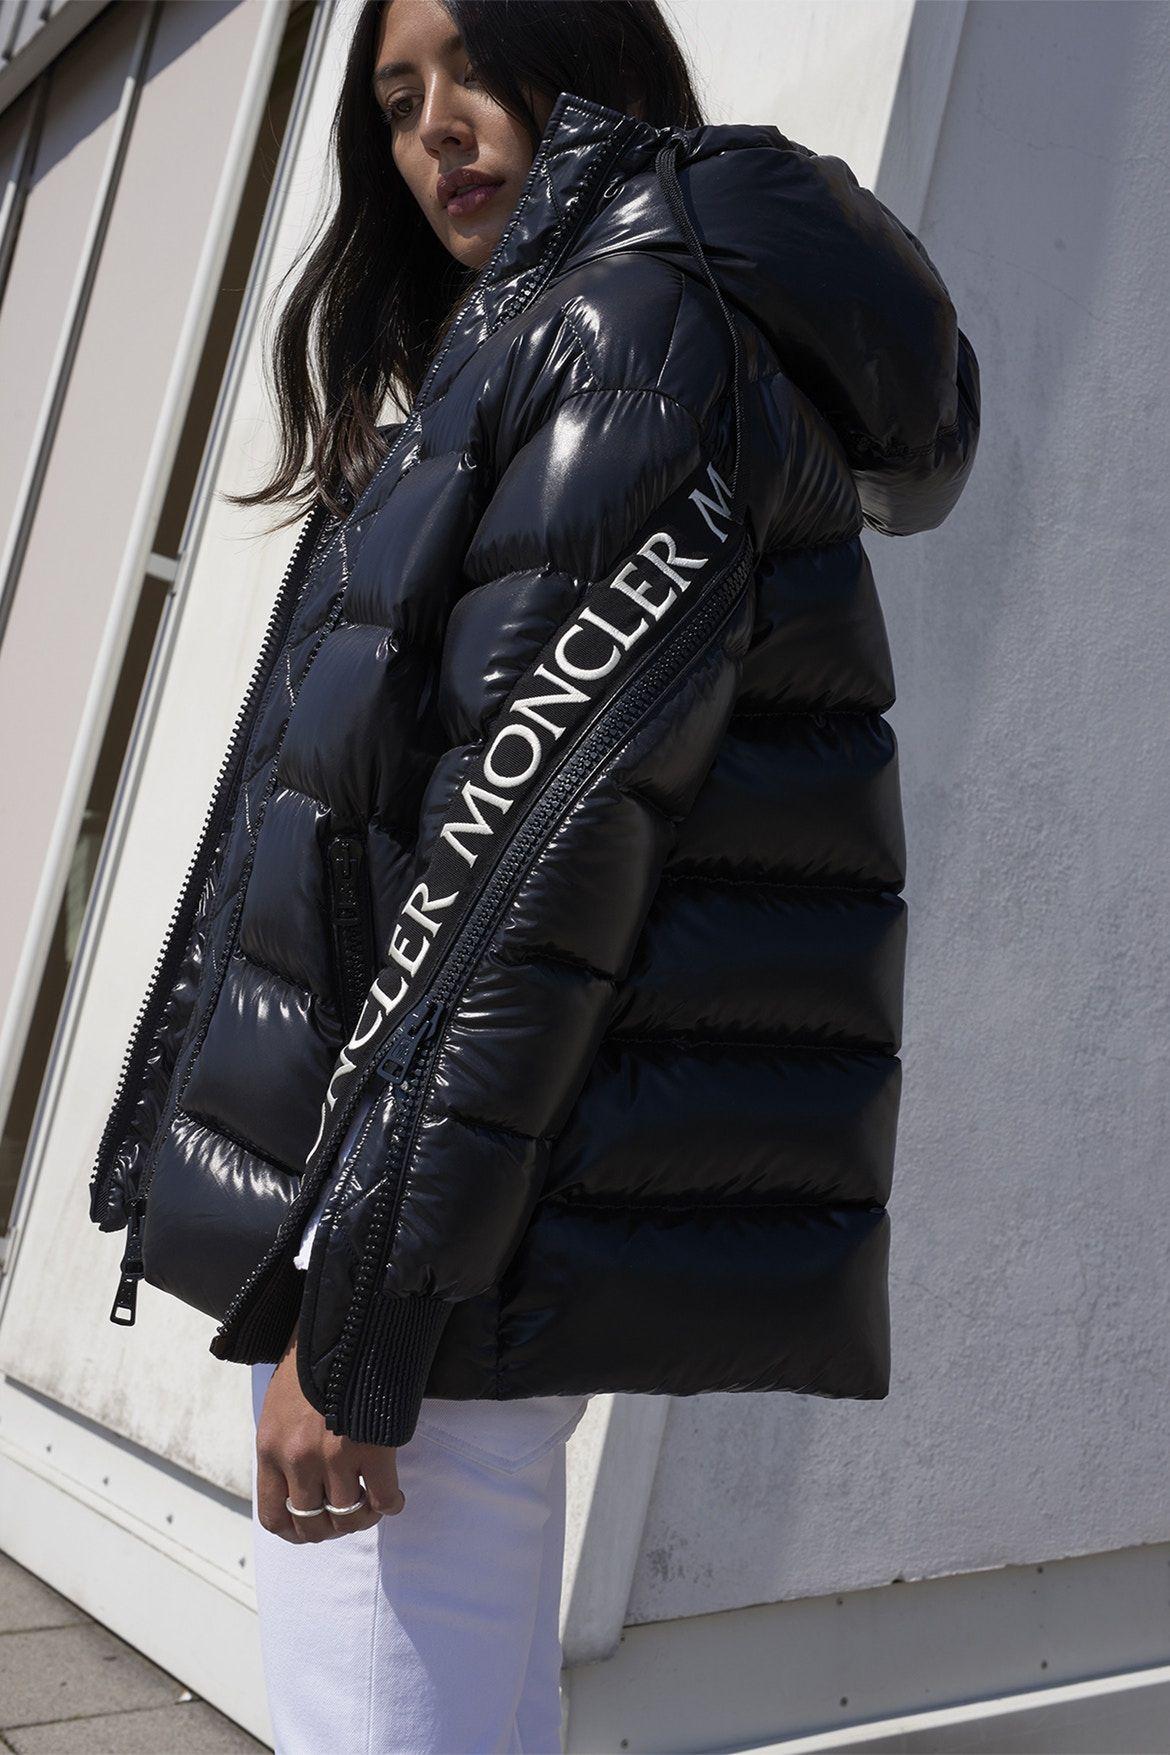 b161c94133f Image result for moncler bandolvarsity jacket Doudoune Moncler Femme